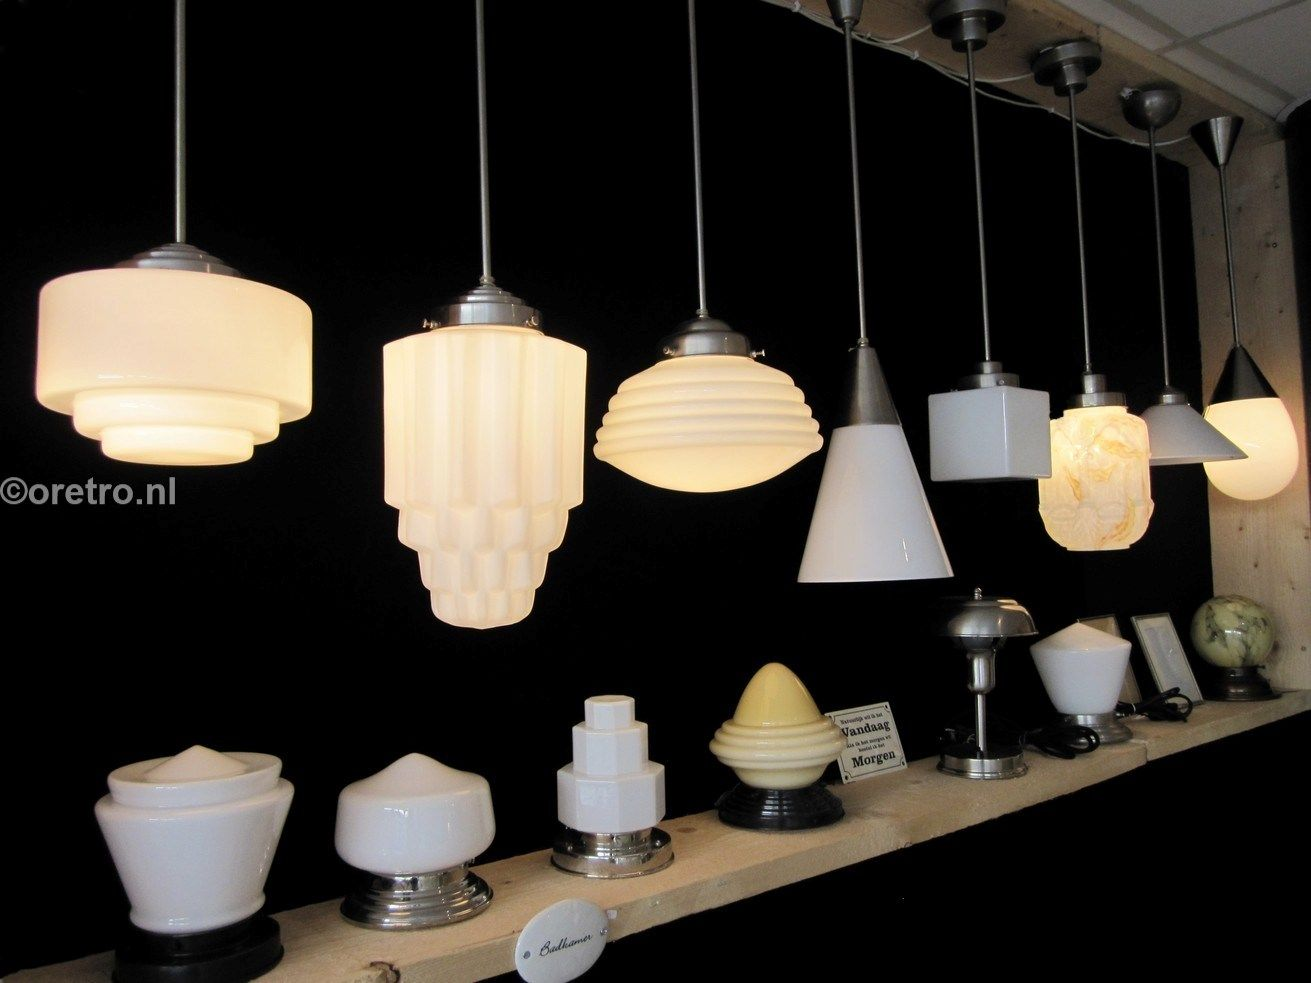 Lampen Winkel Utrecht : Art deco lampen jaren gispenstijl oretro for the